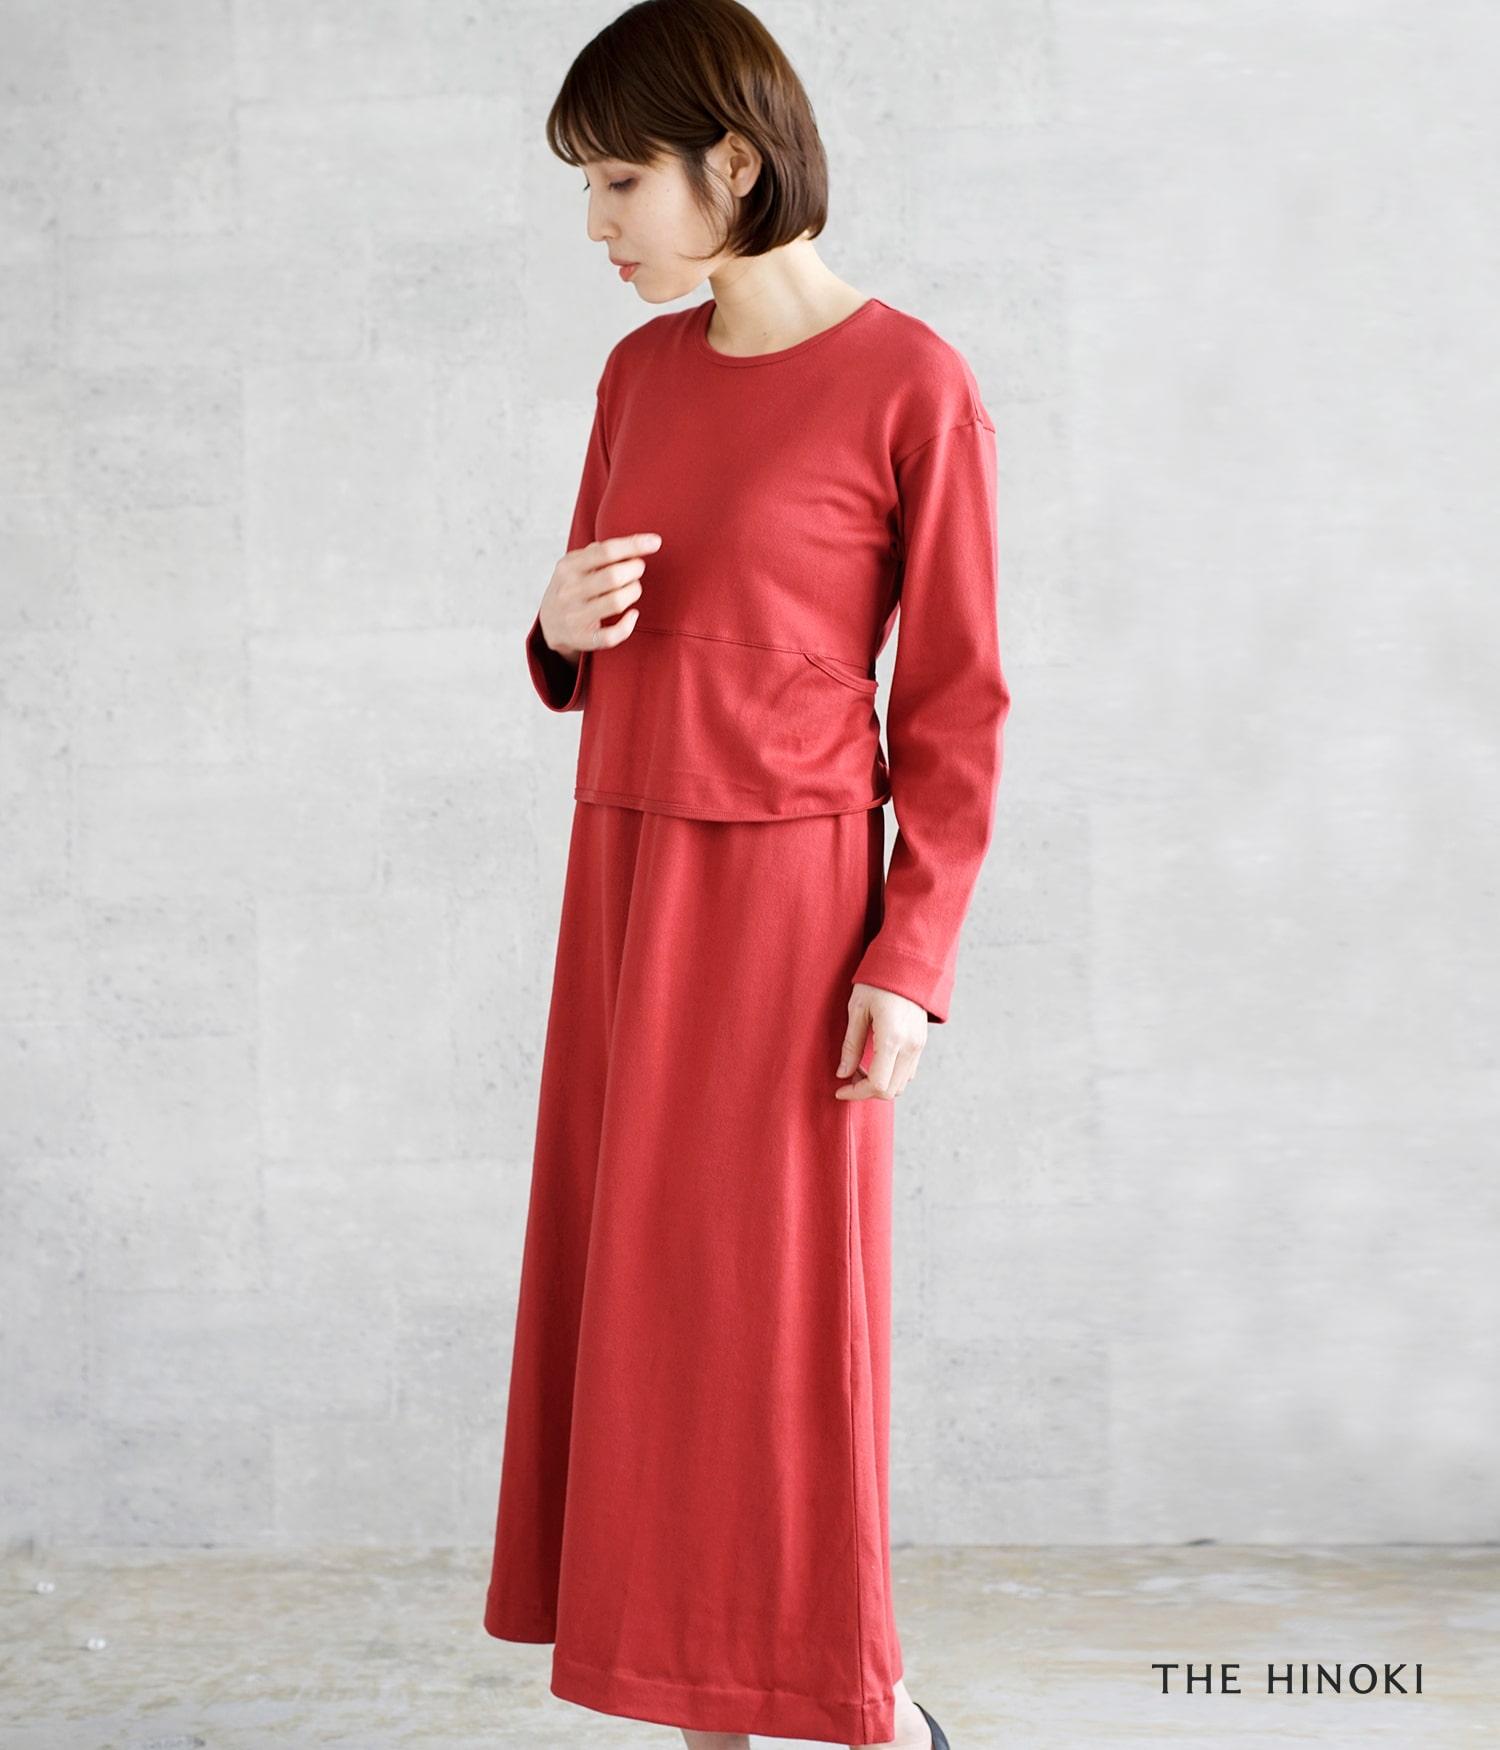 THE HINOKI(ザ ヒノキ)オーガニックコットン ロングスリーブベルテッドドレス th19s-25